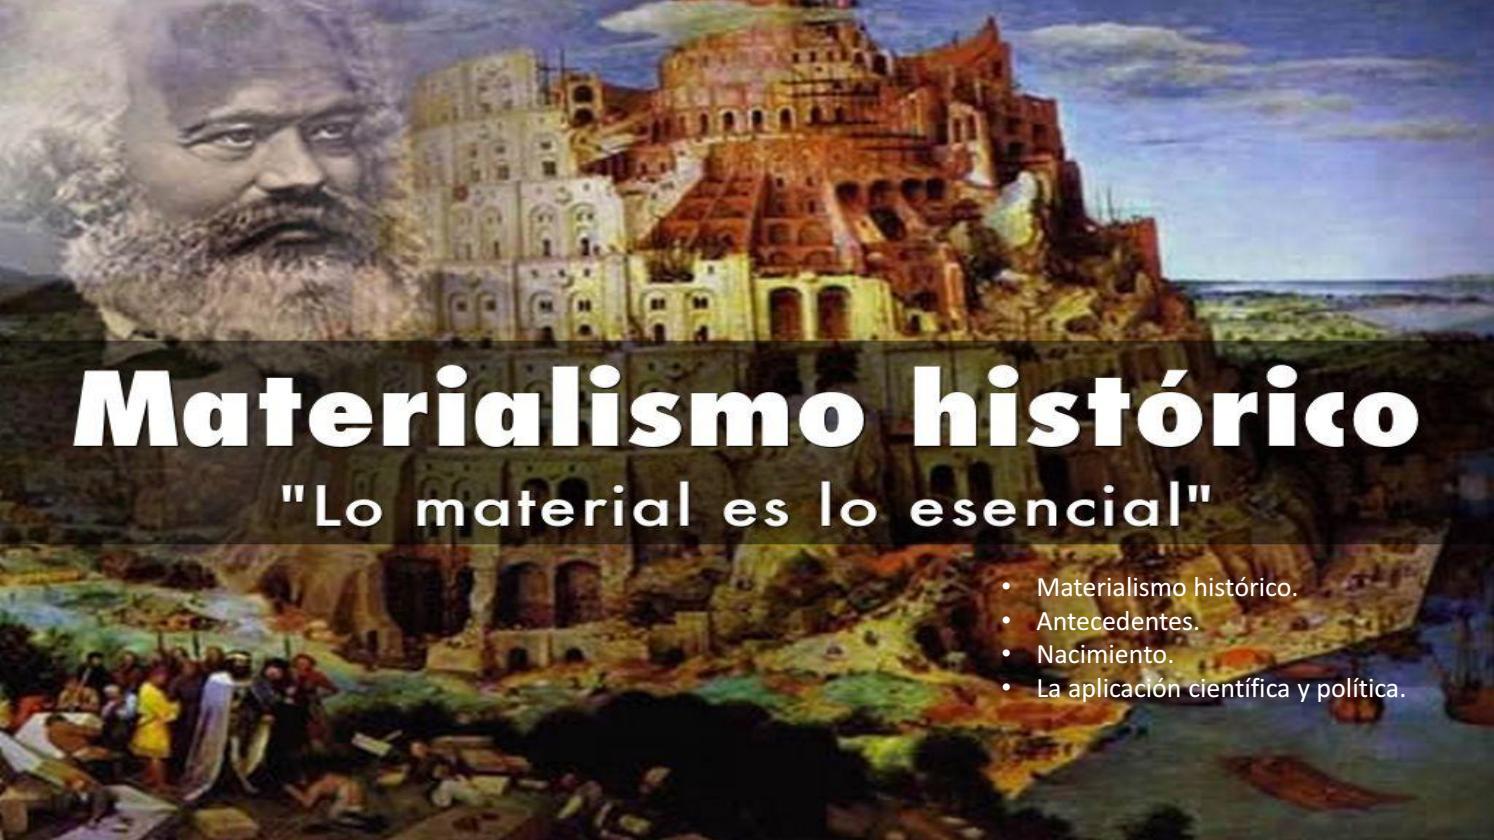 Revista materialismo historico by TATIANA MENDEZ - Issuu | 1494 x 840 jpeg 162kB